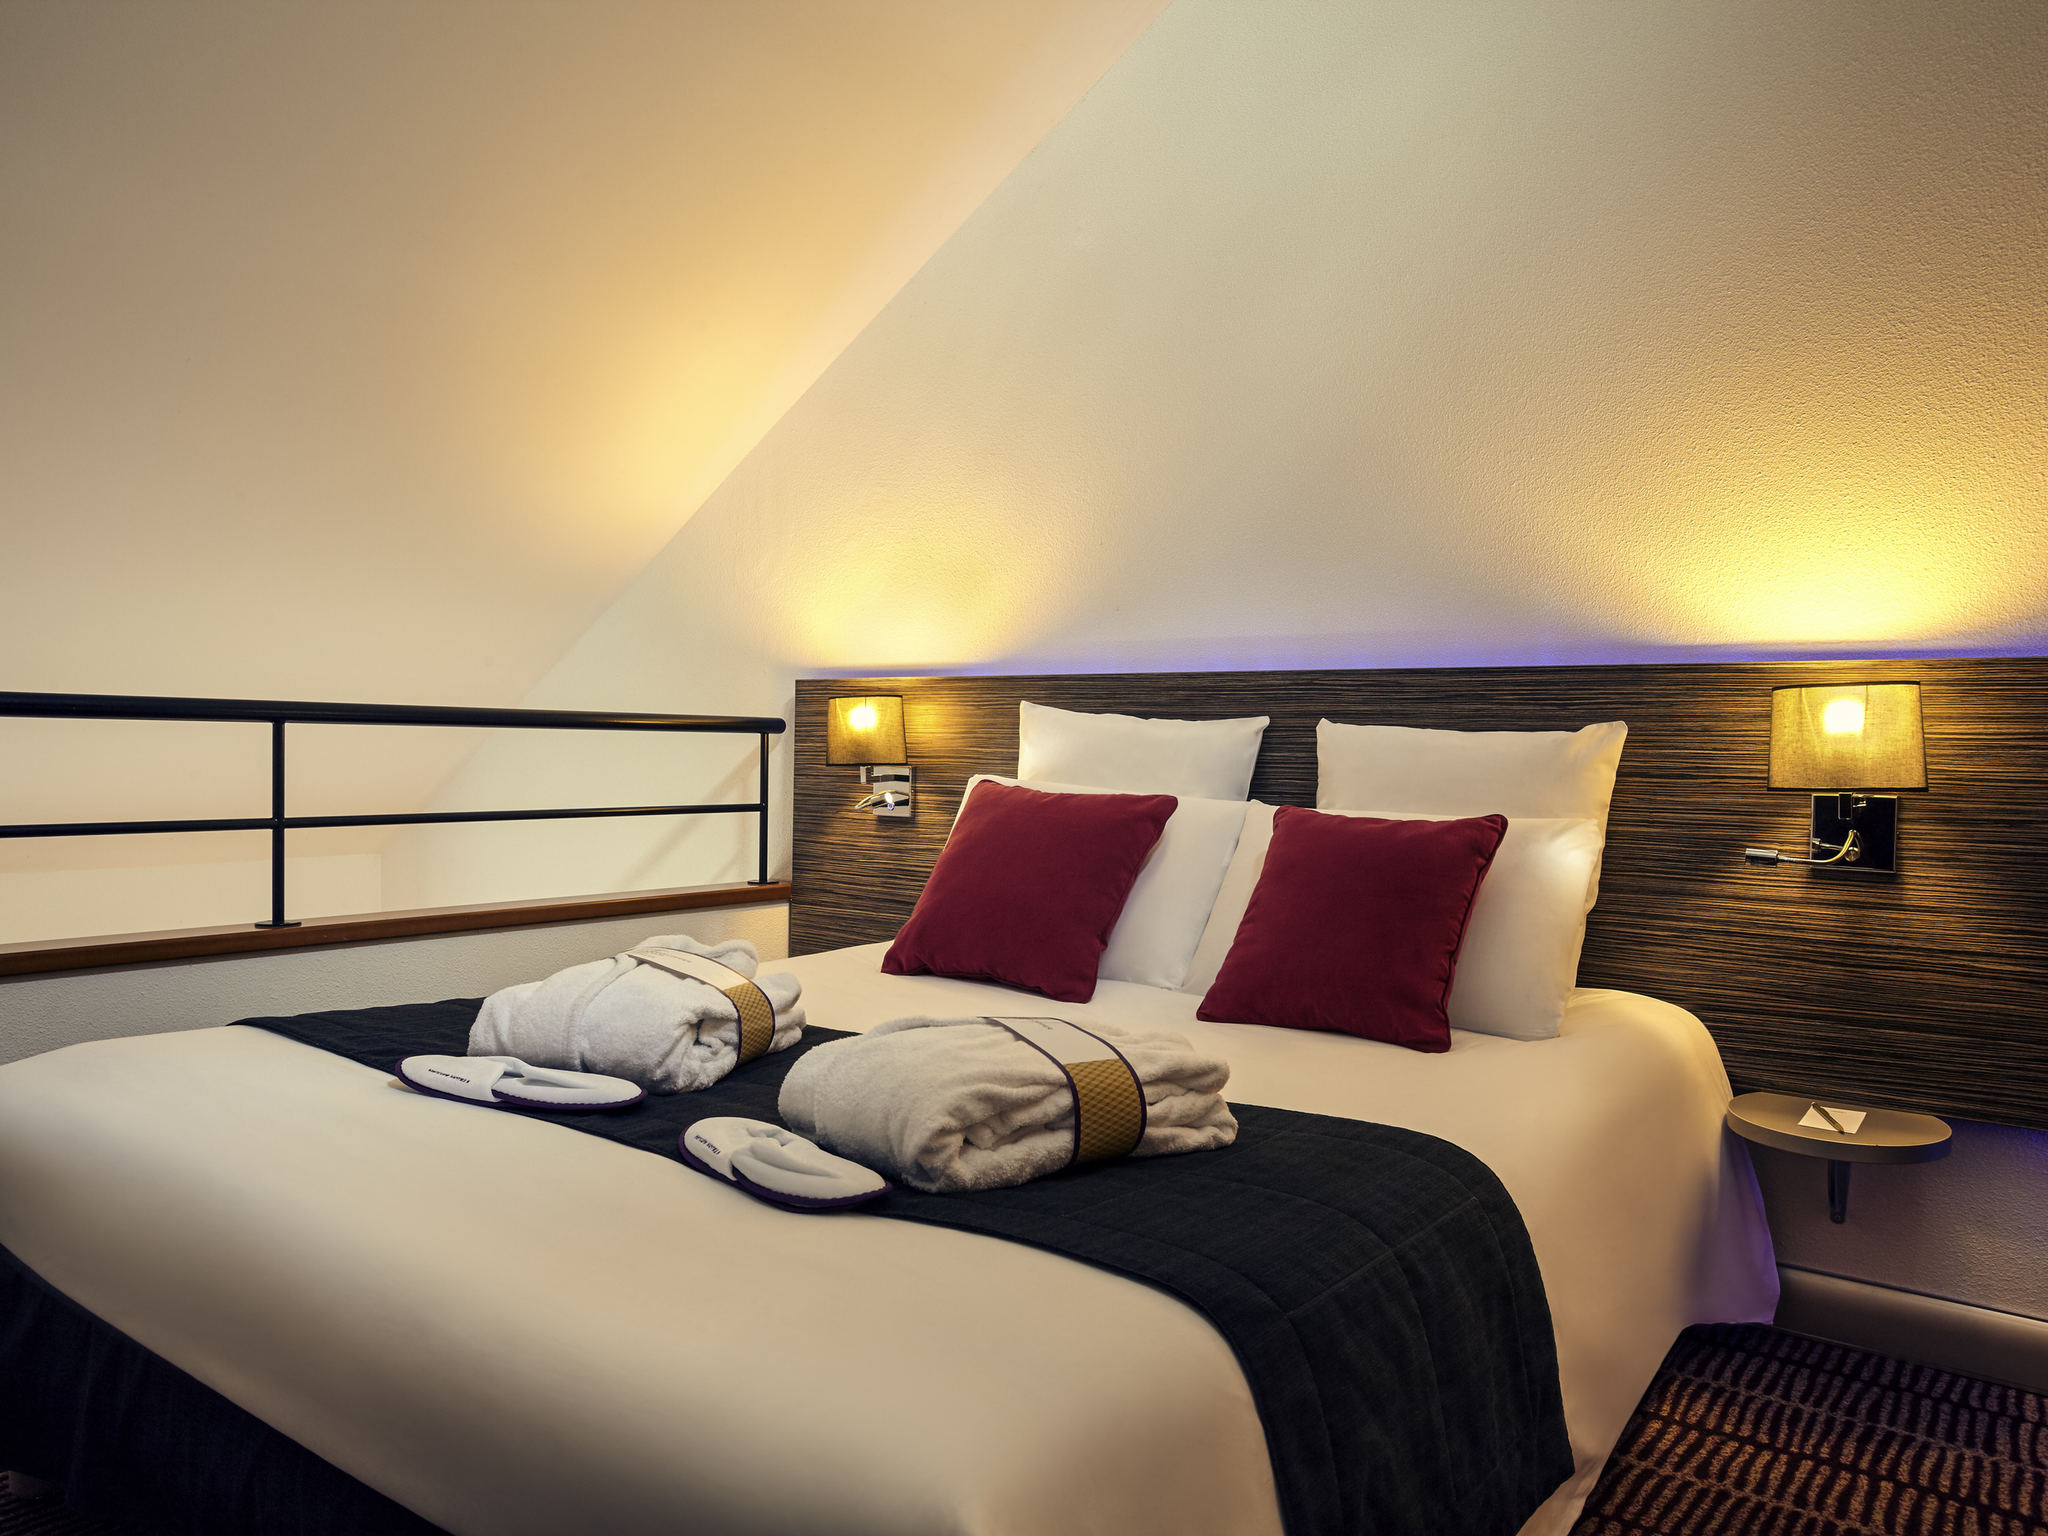 Hotel Spa Blois